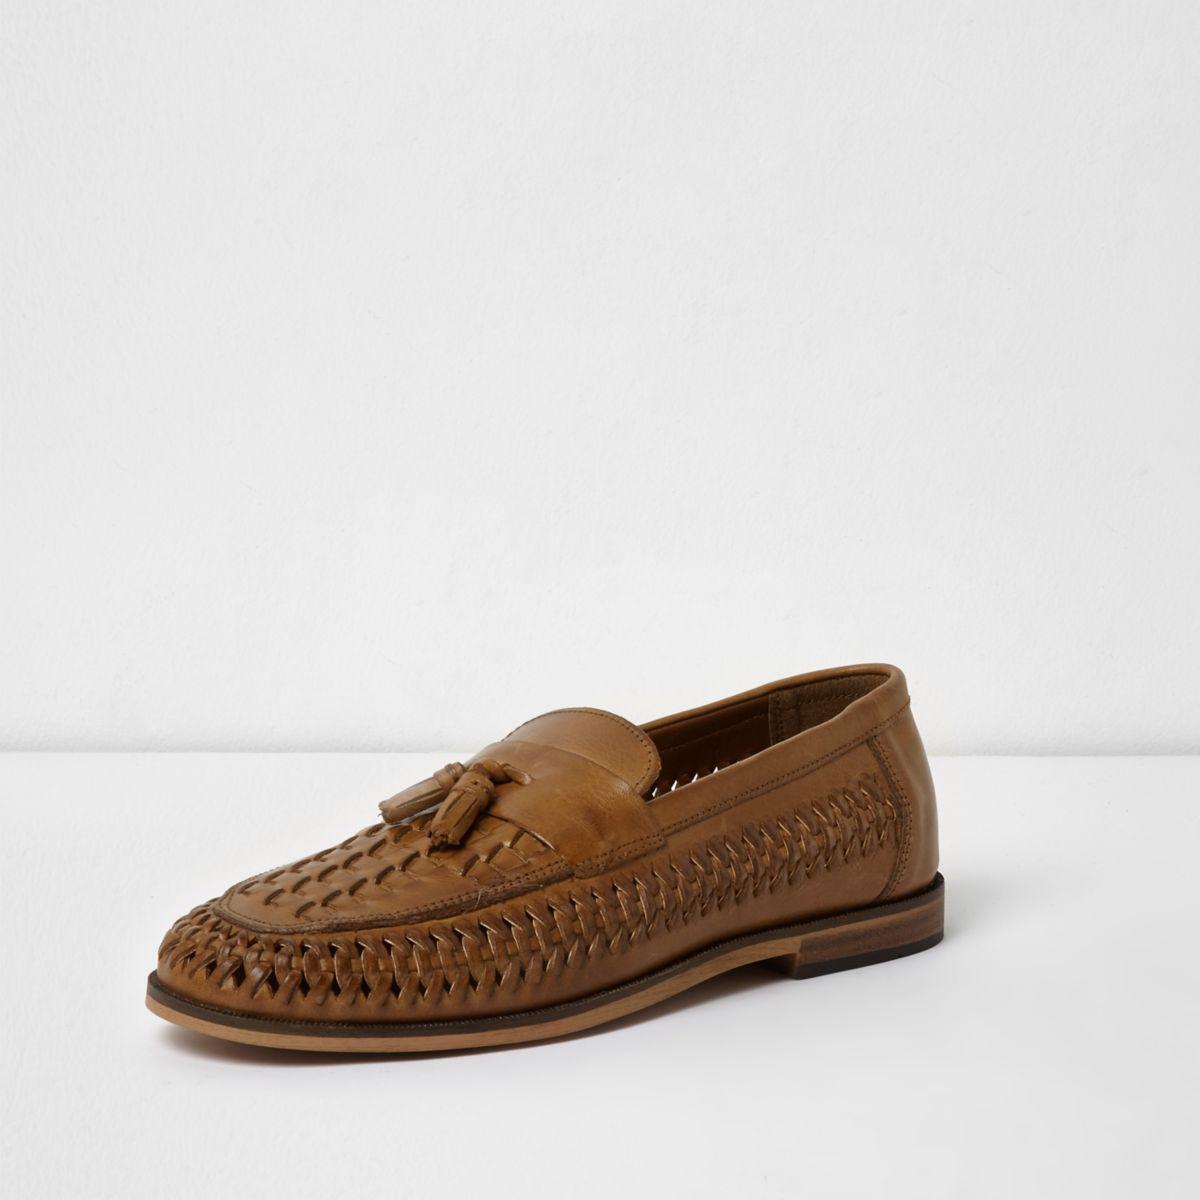 Lyst River Island Tan Leather Woven Tassel Loafers Tan